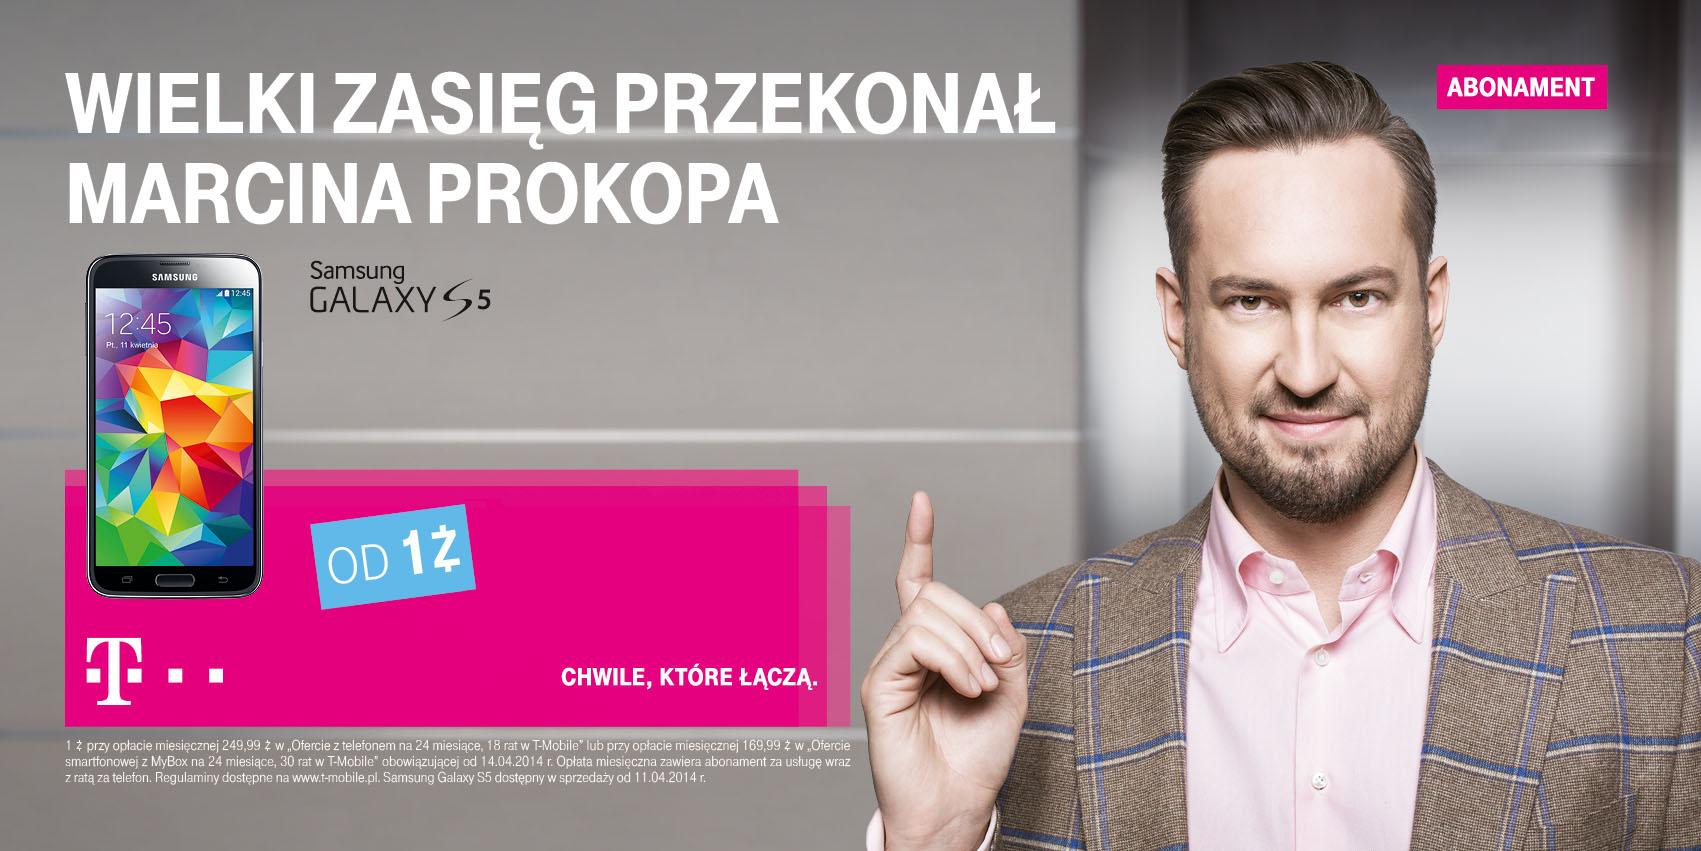 en61-polish-złoty-symbol_11